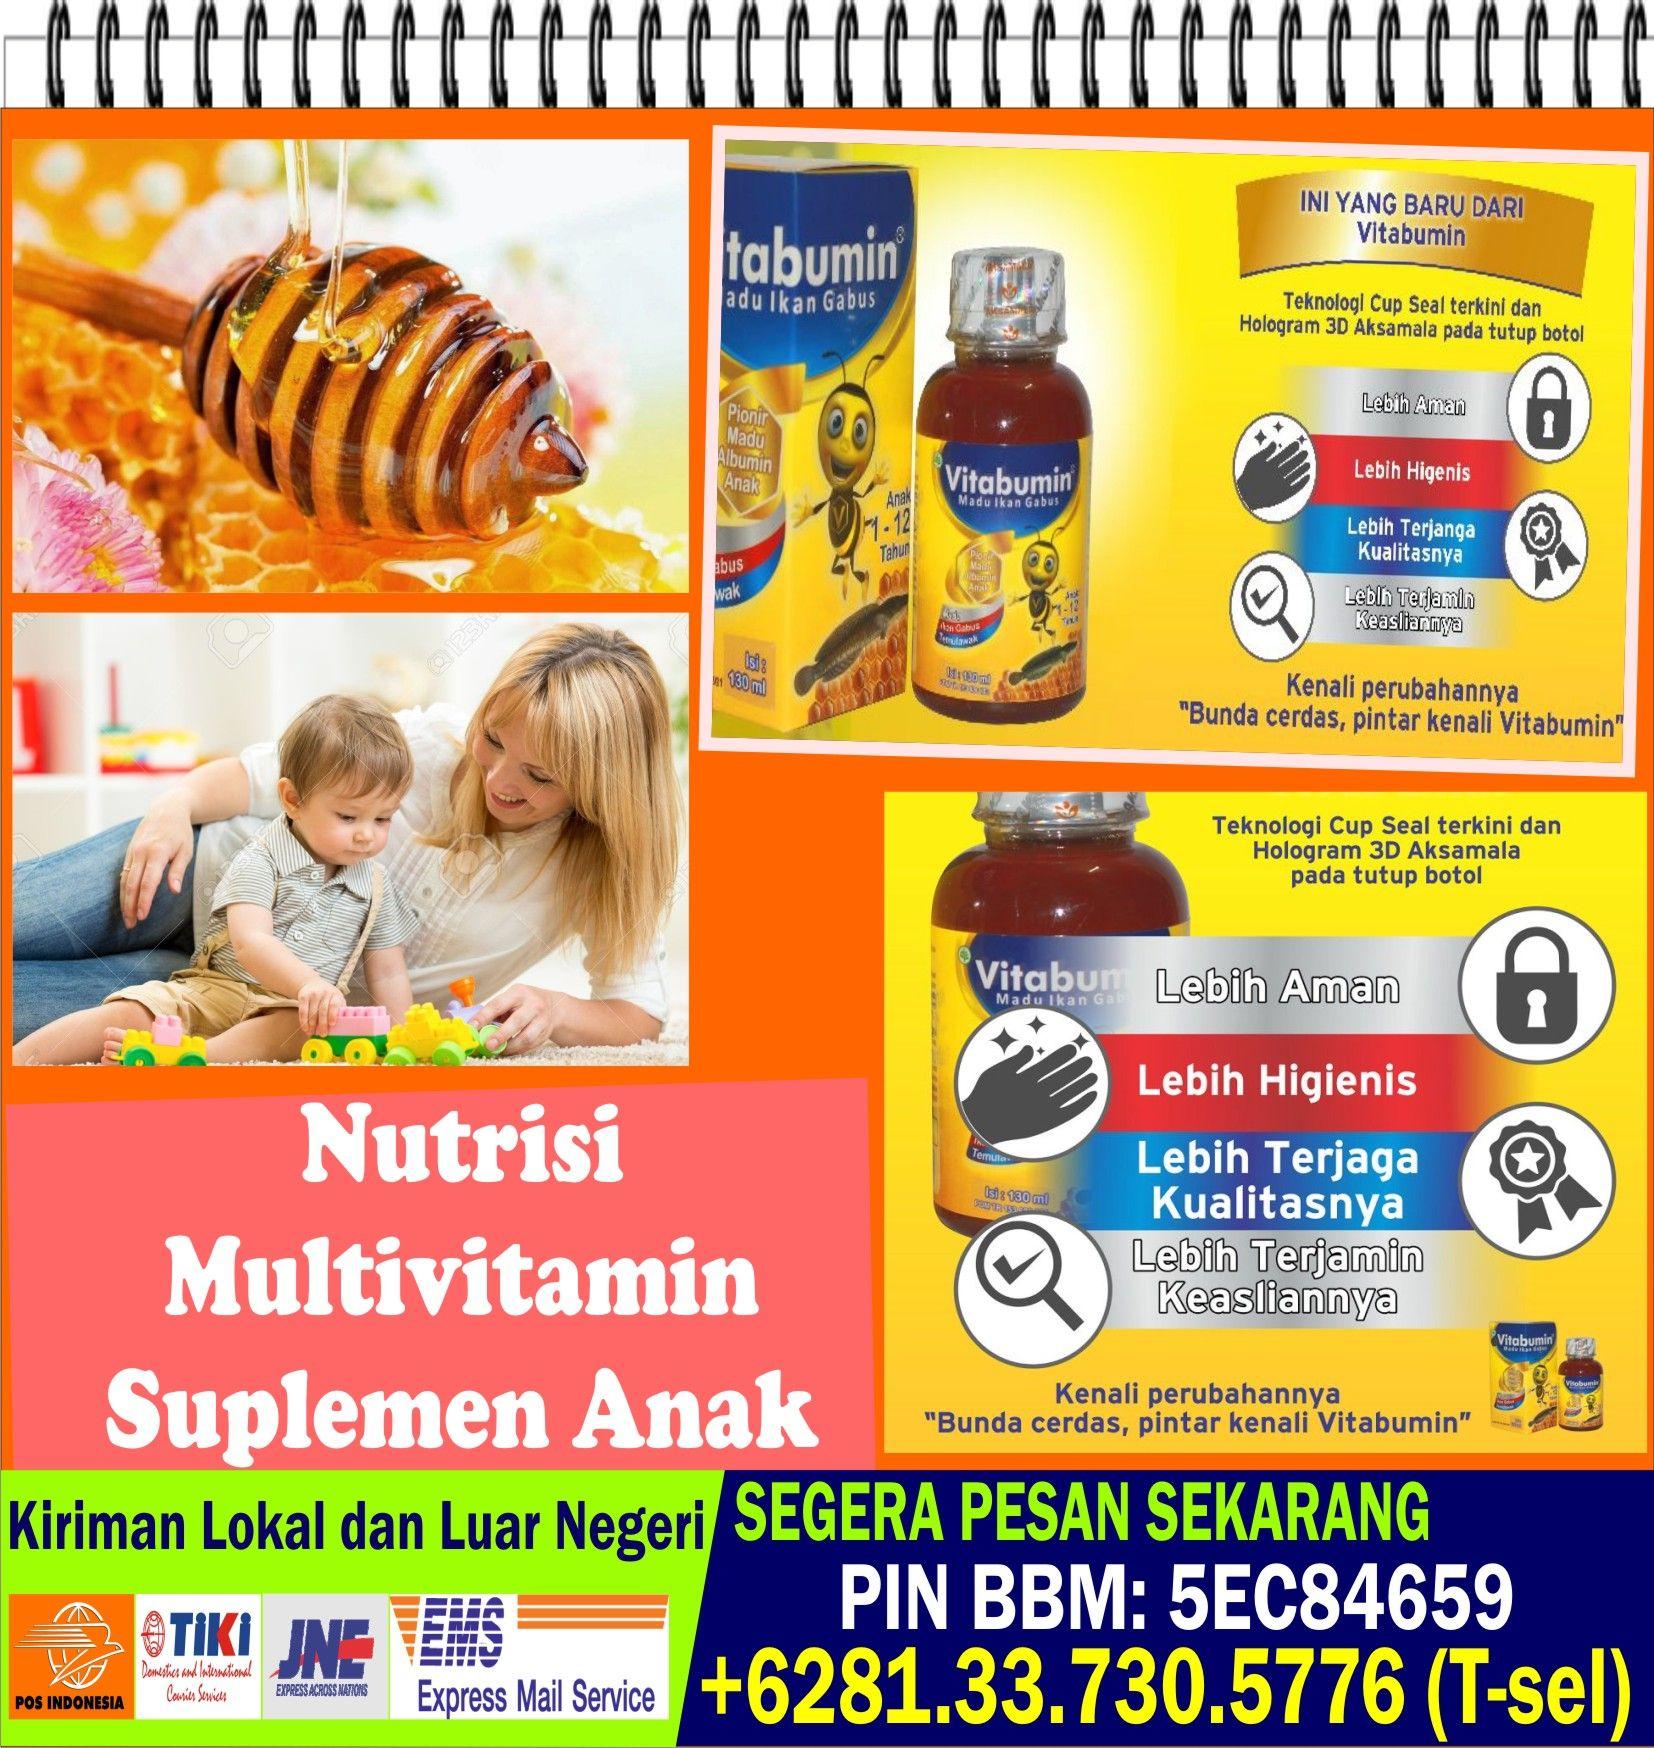 Toko Vitamin Online, Jual Vitabumin Yogyakarta, Asupan